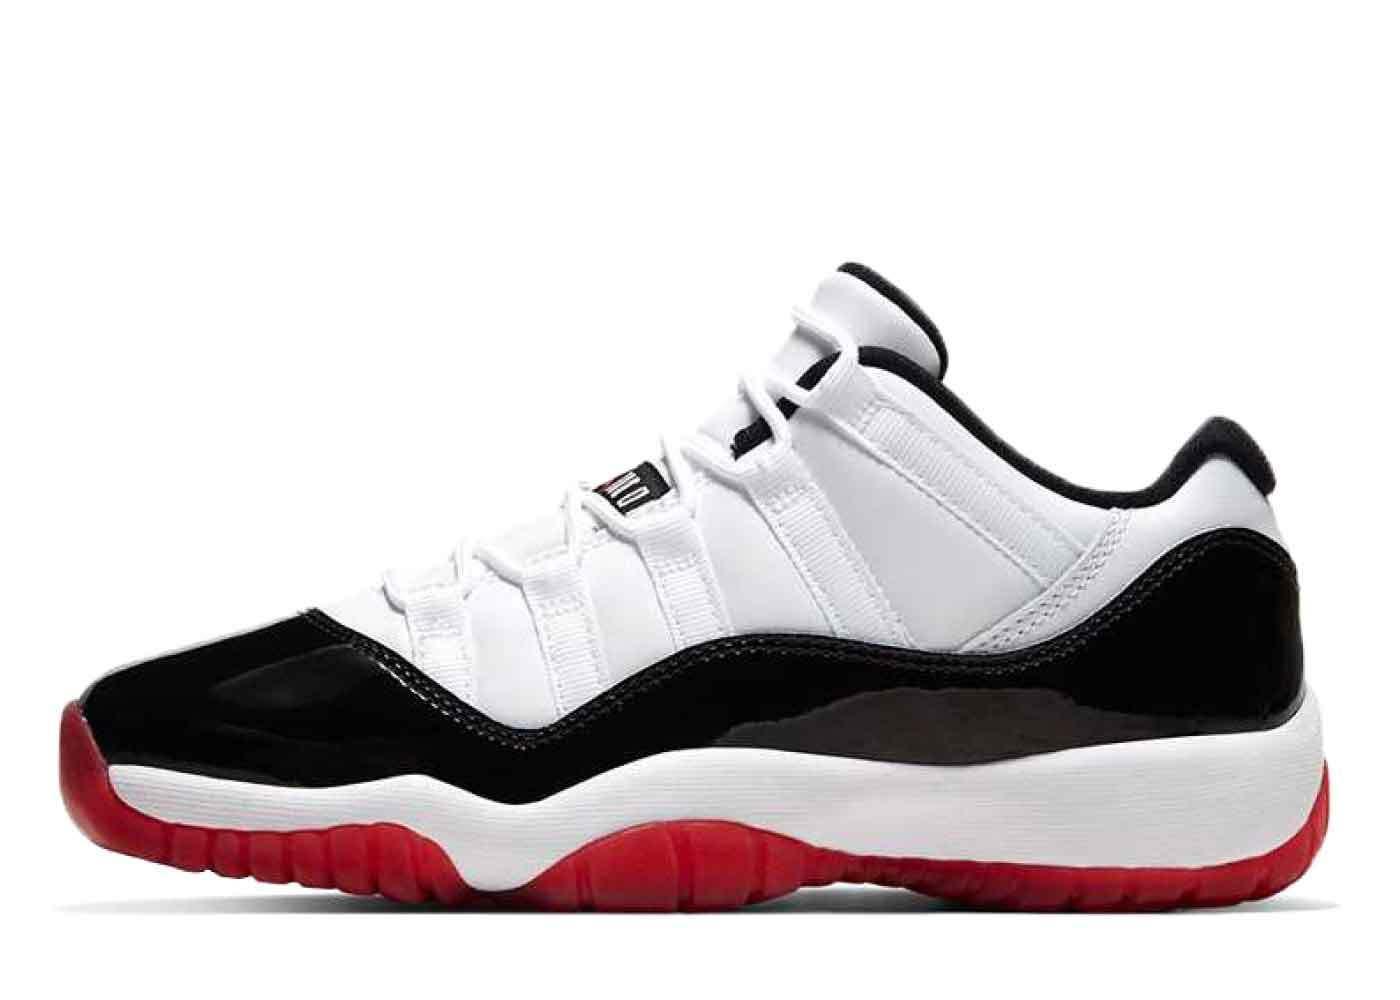 Nike Air Jordan 11 Low White Bred (GS)の写真